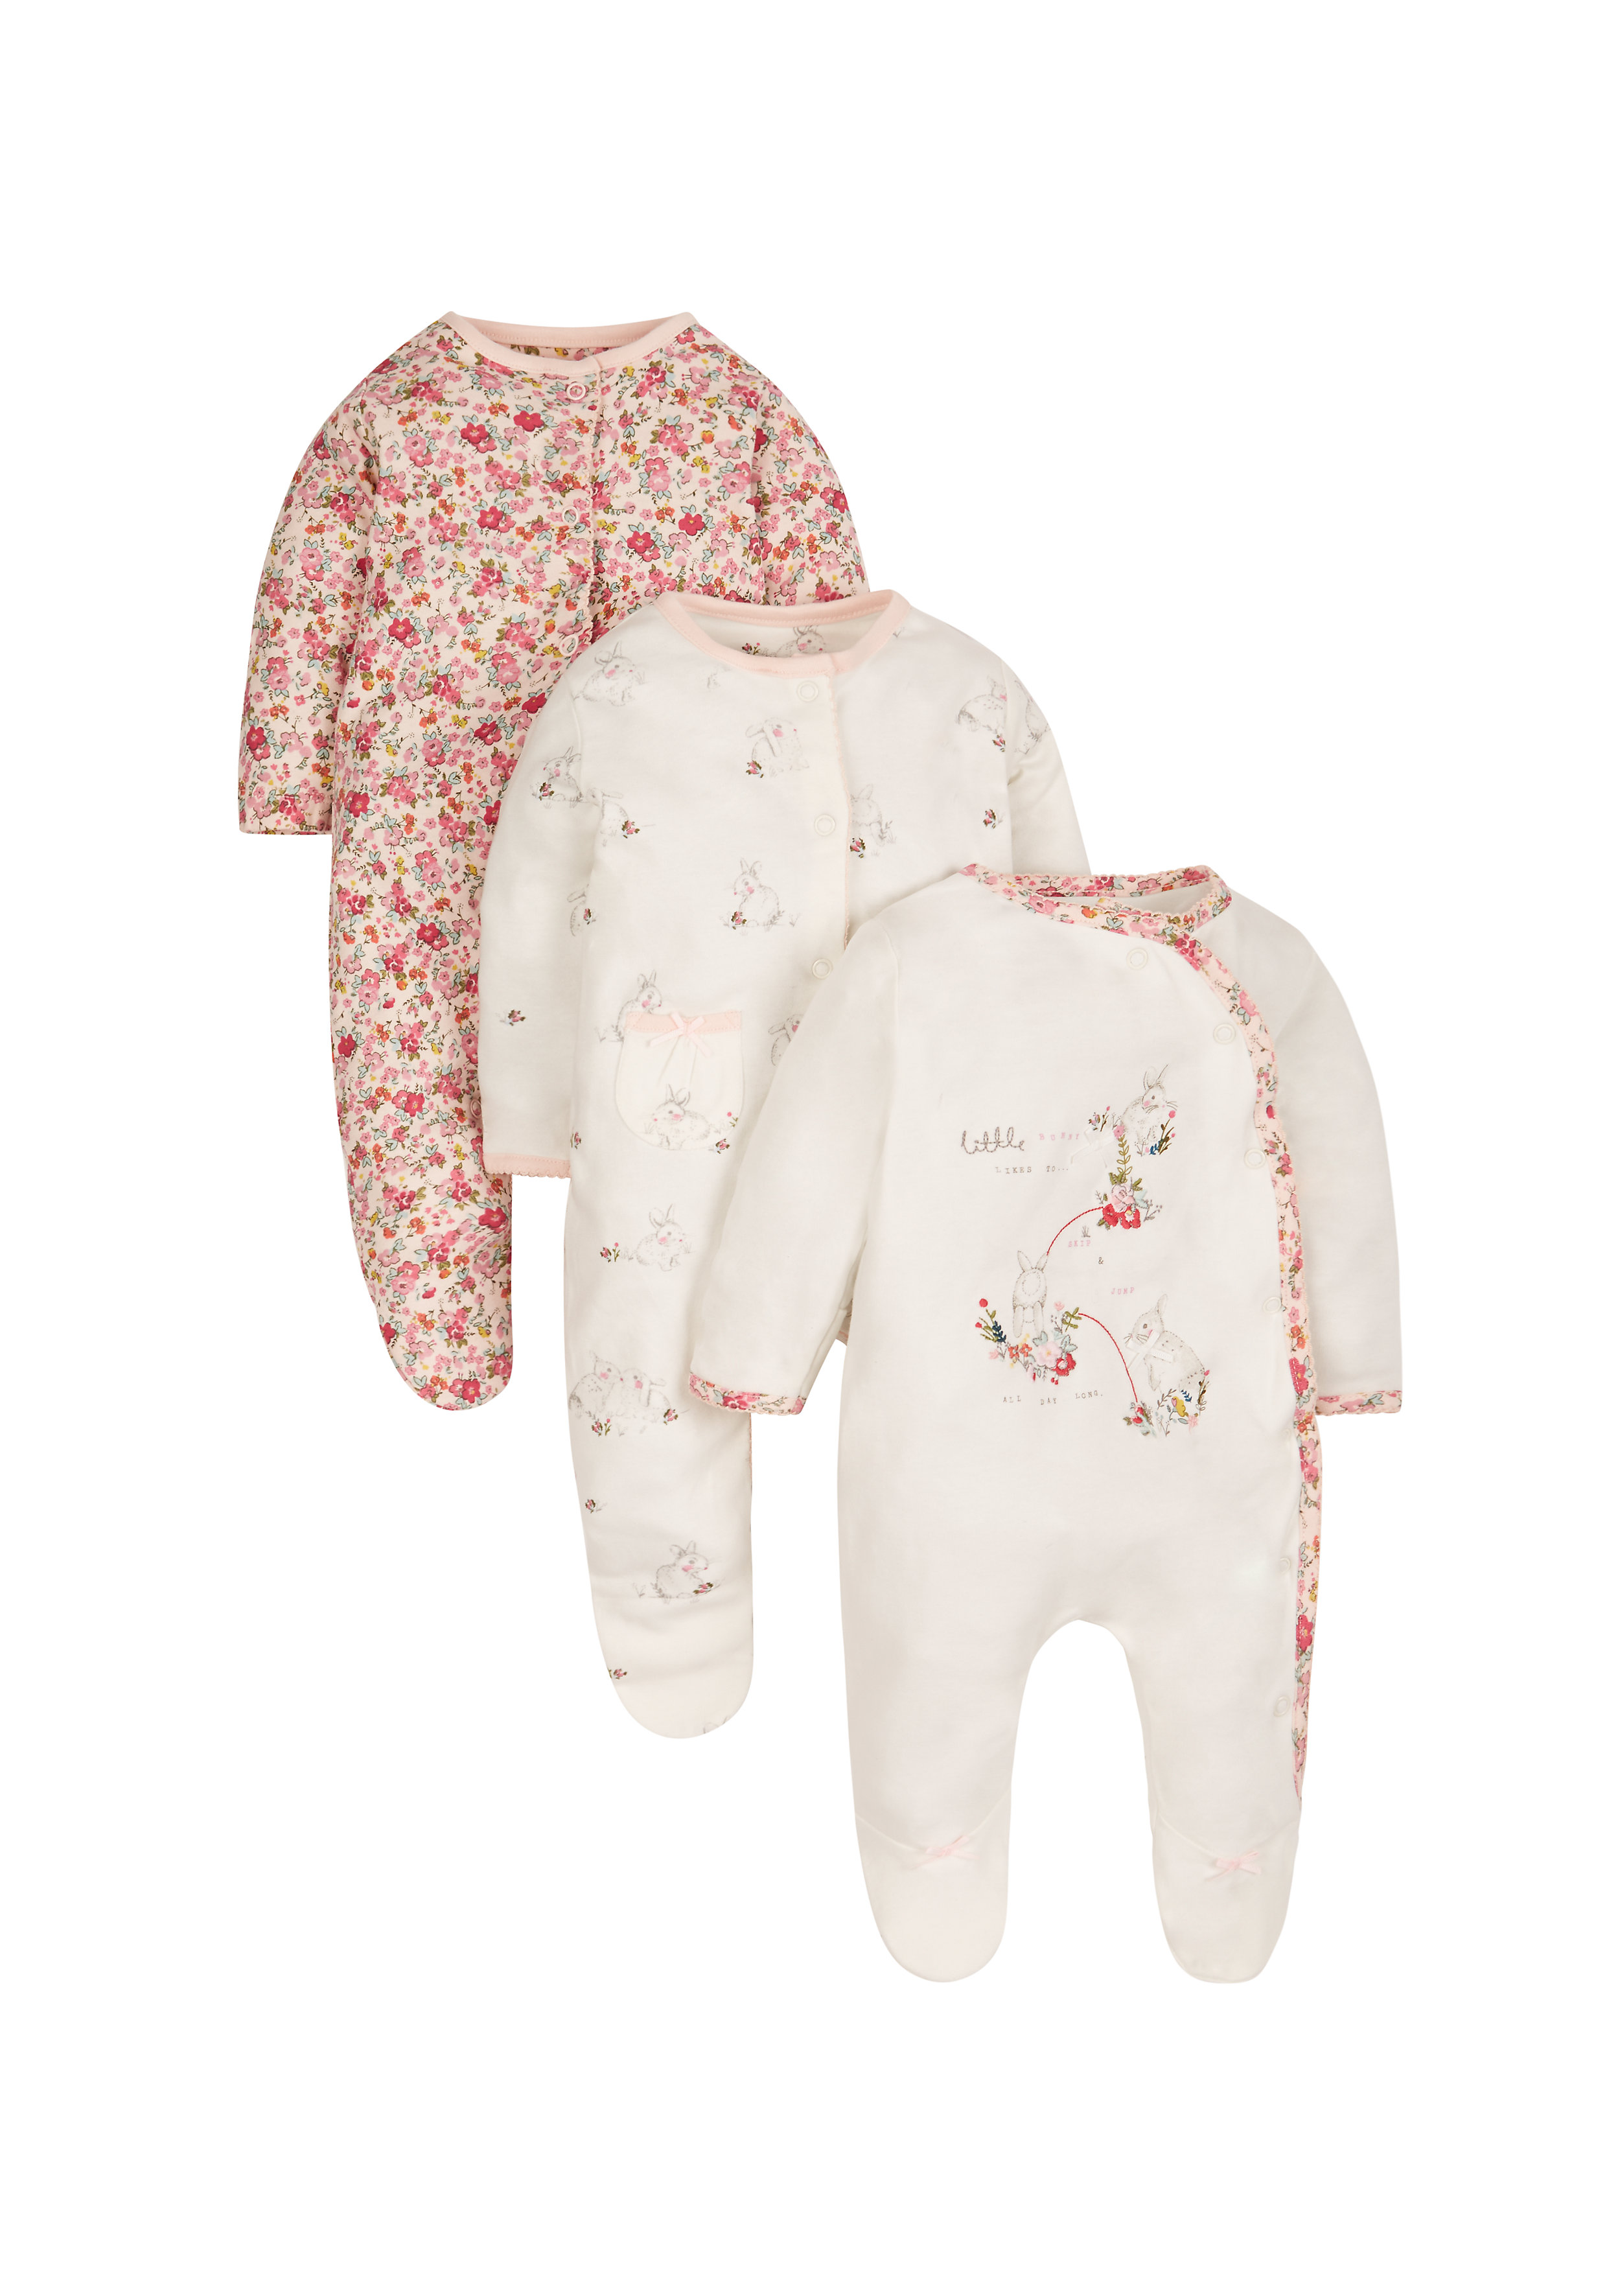 Mothercare | Girls Autumn Garden Sleepsuits - Pack Of 3 - Cream